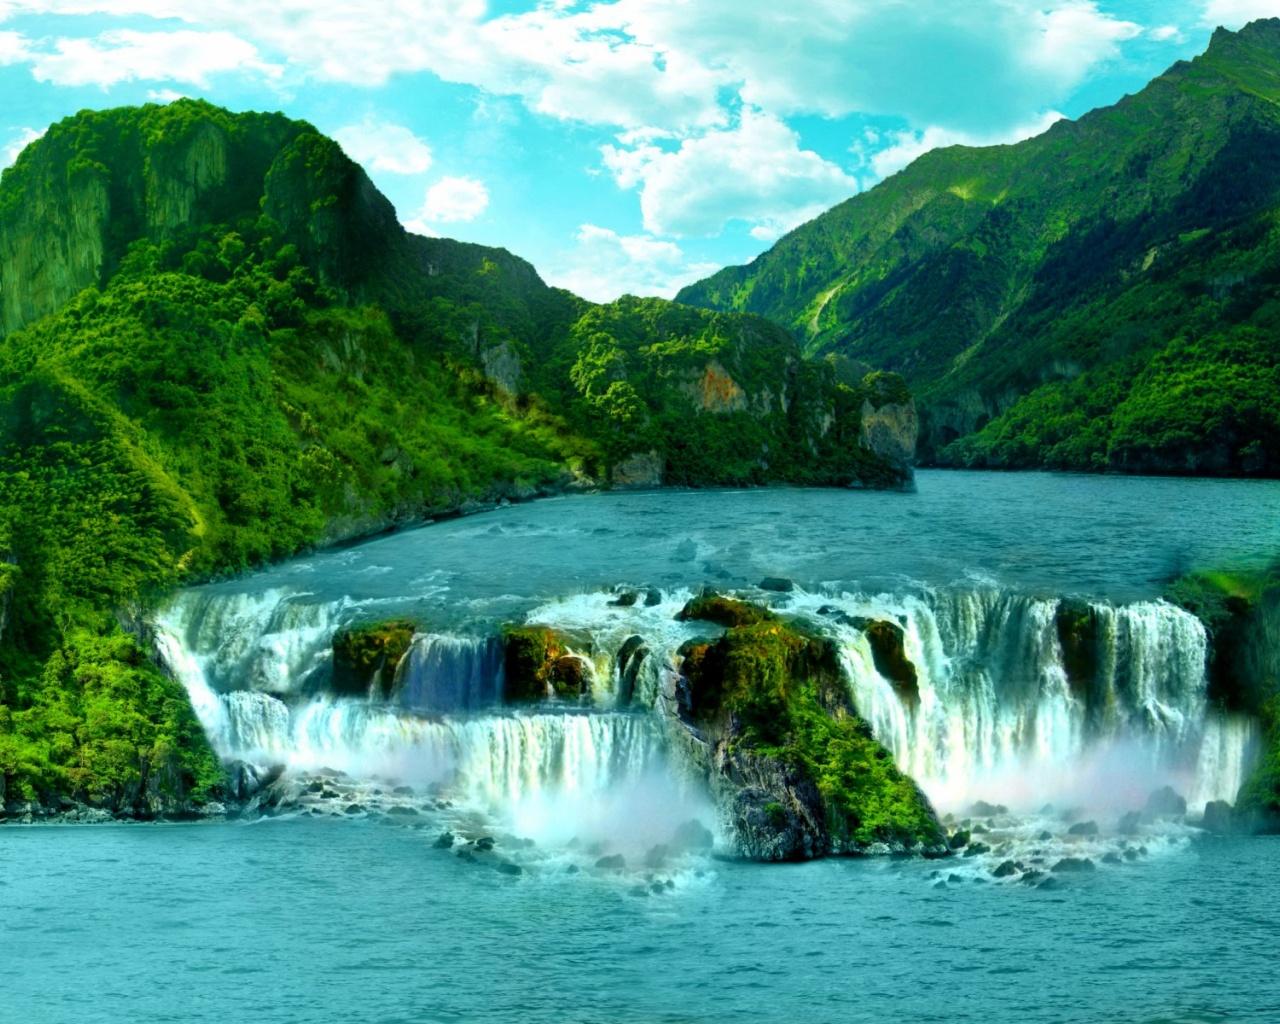 1280x1024 Tropical Waterfall desktop PC and Mac wallpaper